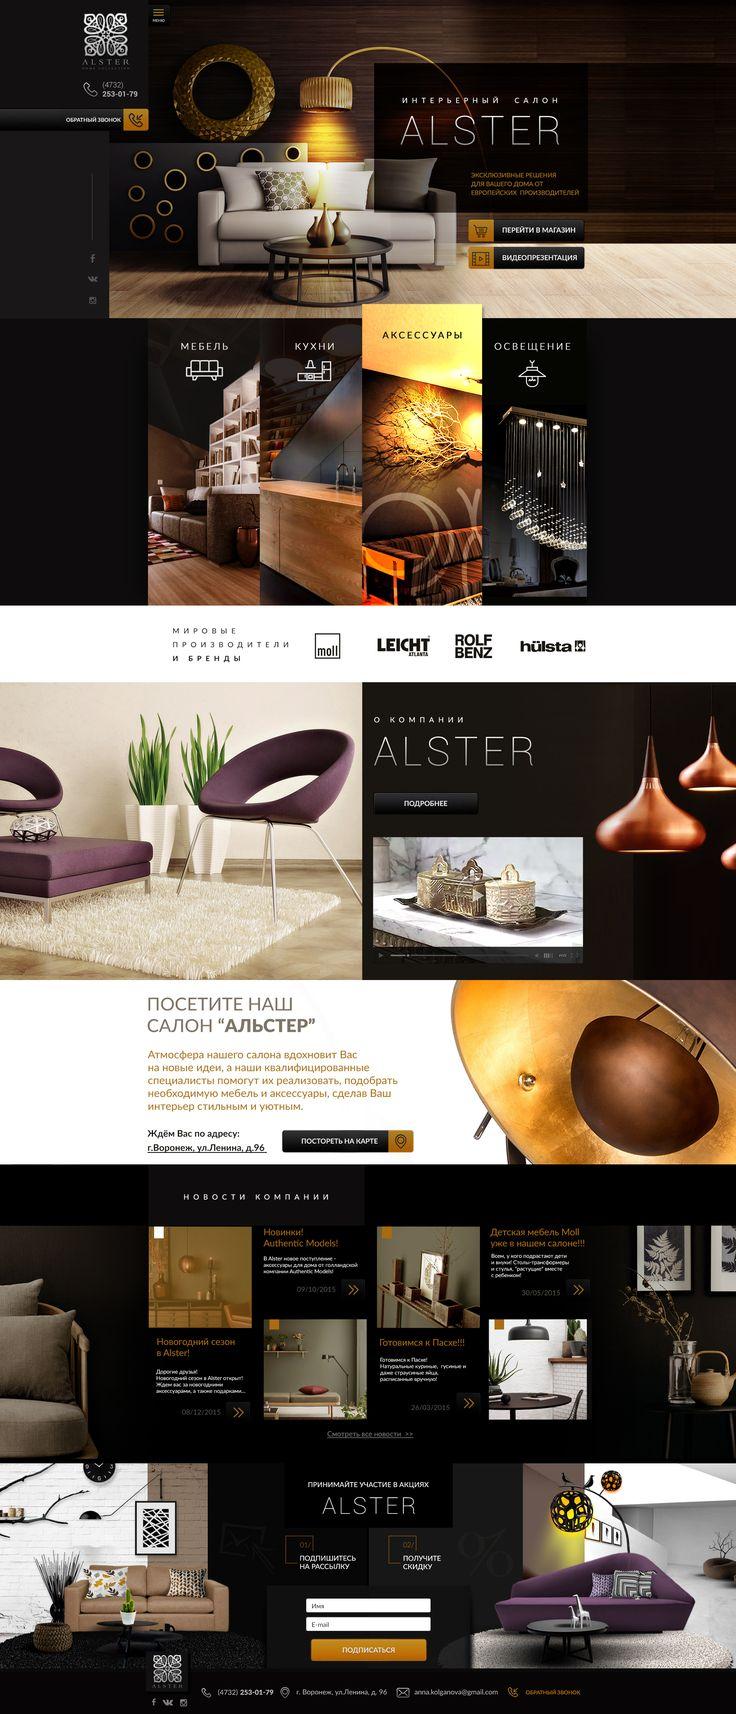 ALSTER interior design #landing, #page, #design, #UI/UX, #web, #HTML5, #photoshop, #website, #interiror, #furniture